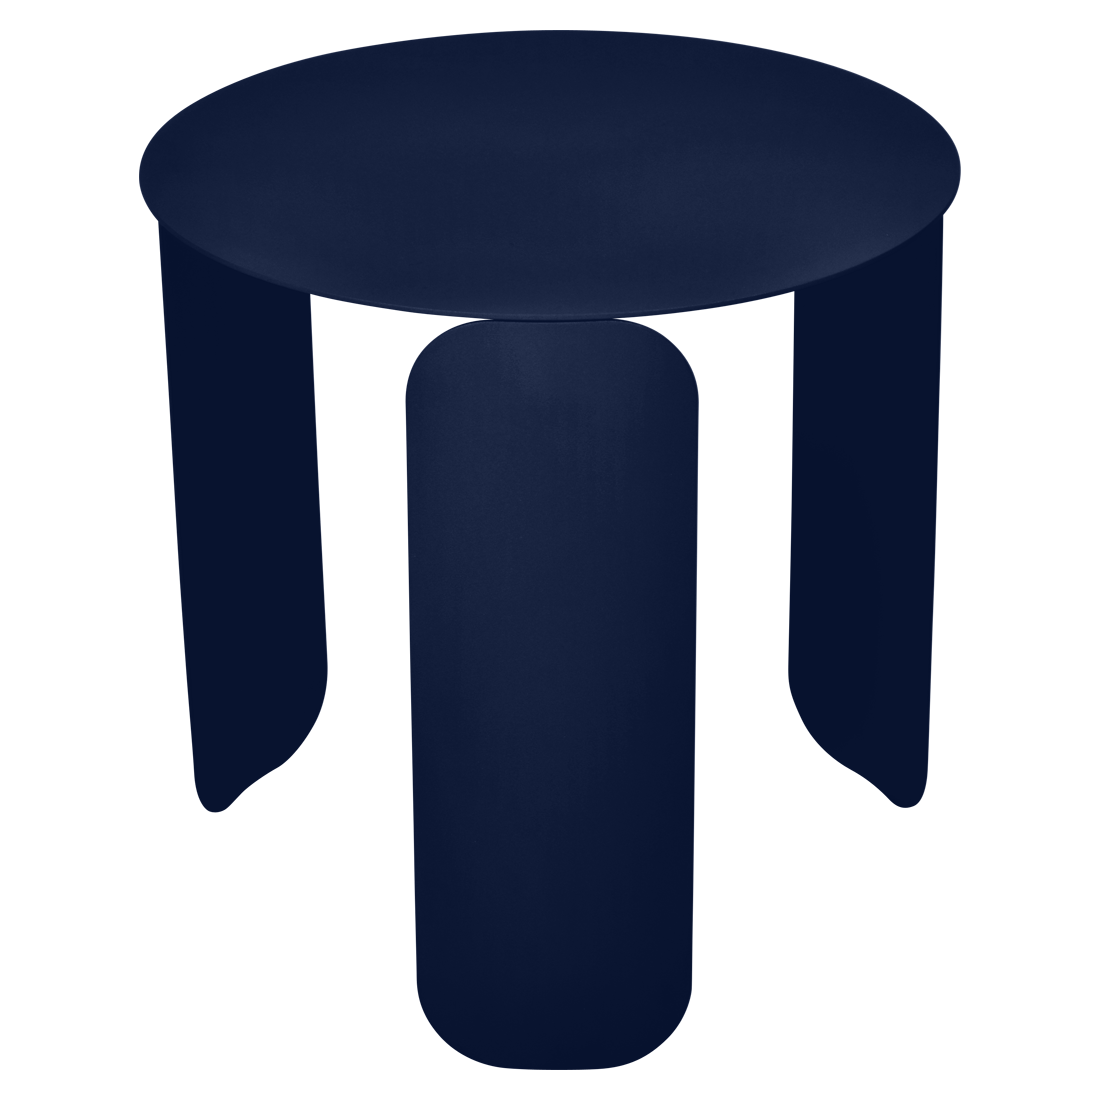 table basse design, table basse metal, table basse fermob, table basse bleu